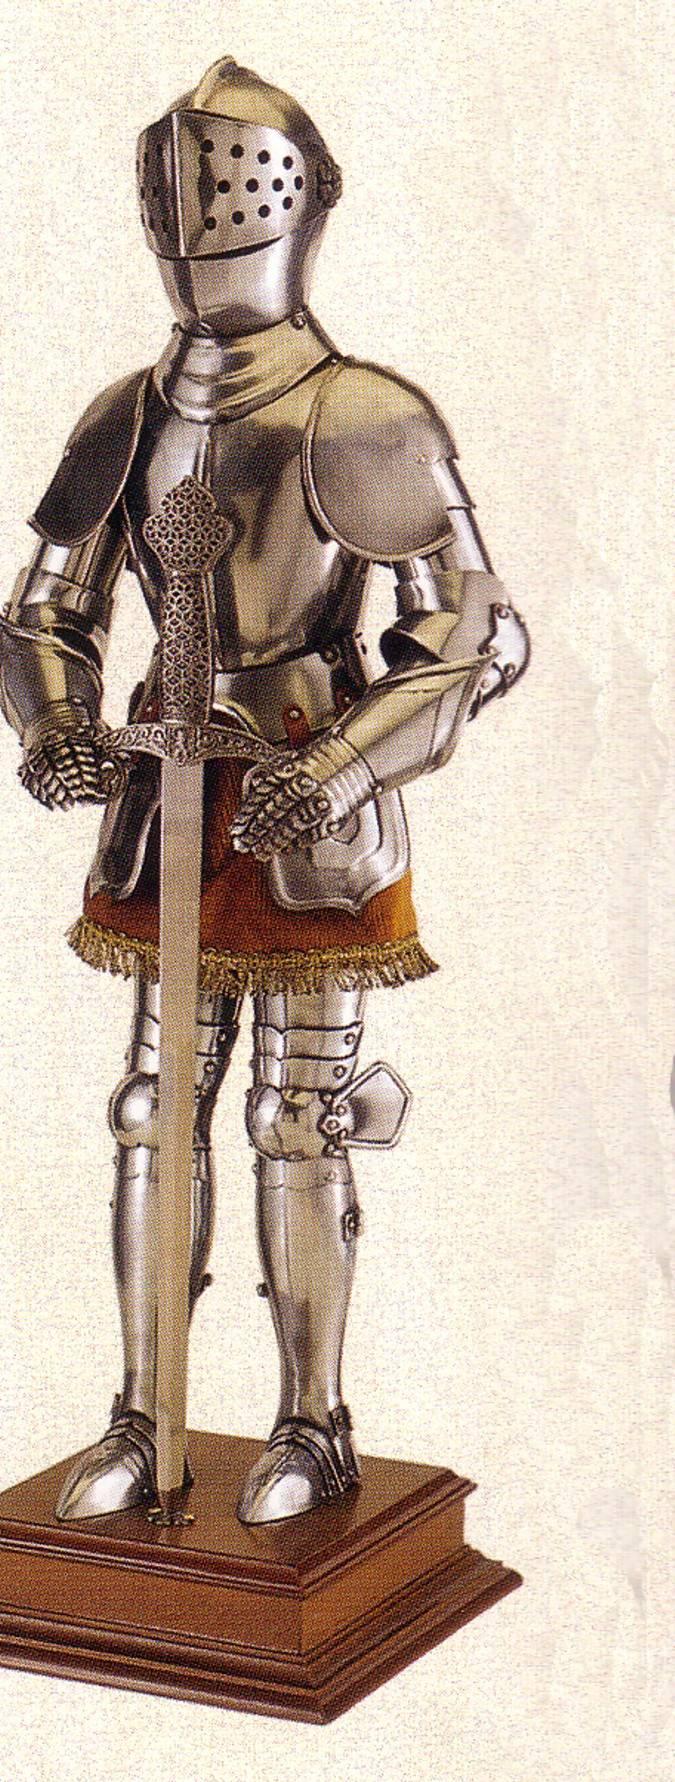 Miniature medieval Armor